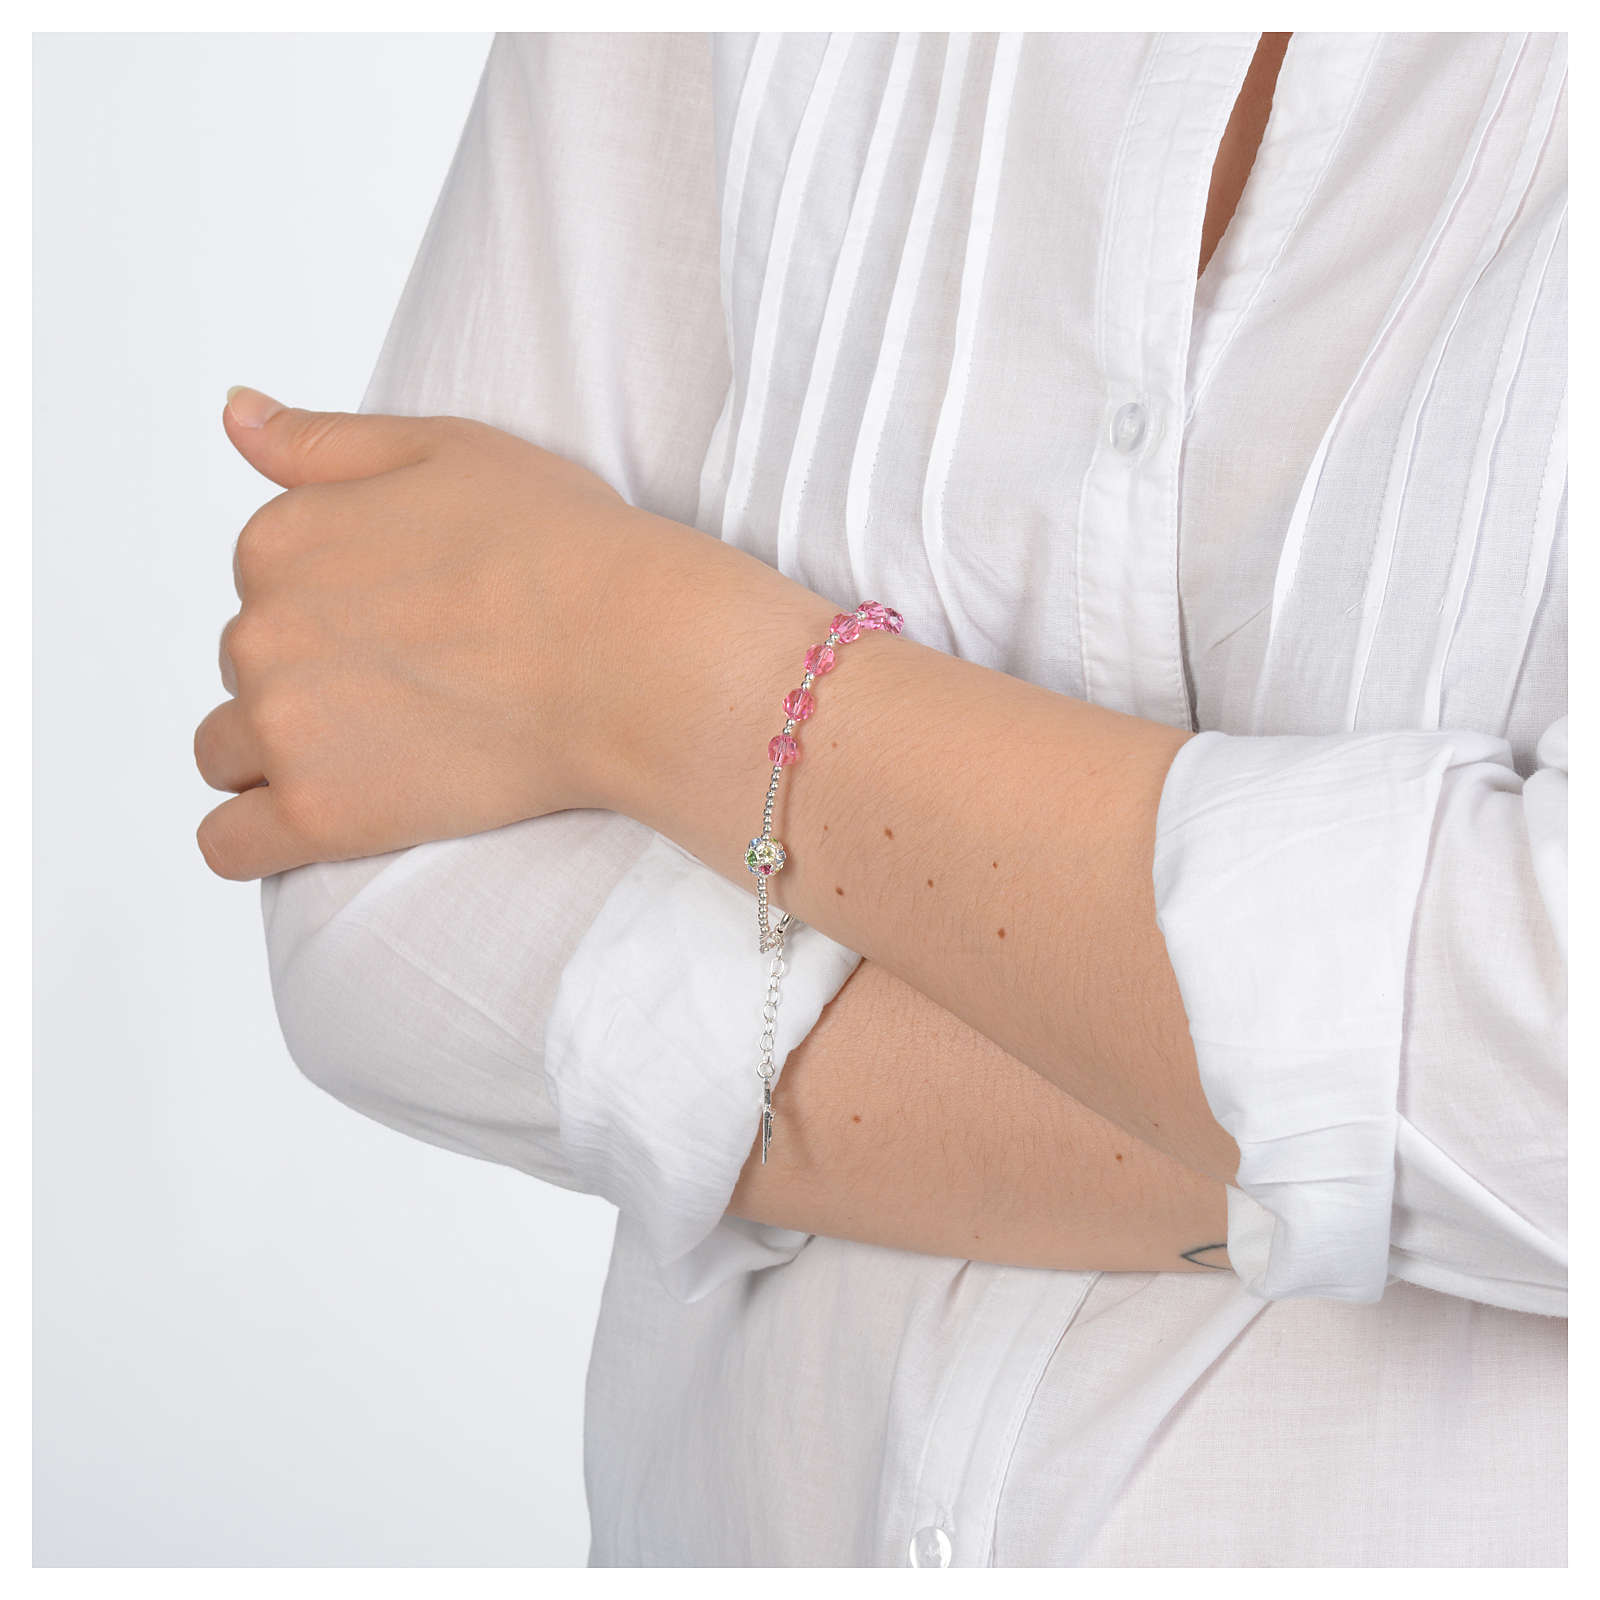 Bracelet chapelet avec Swarovski roses en argent 925 4